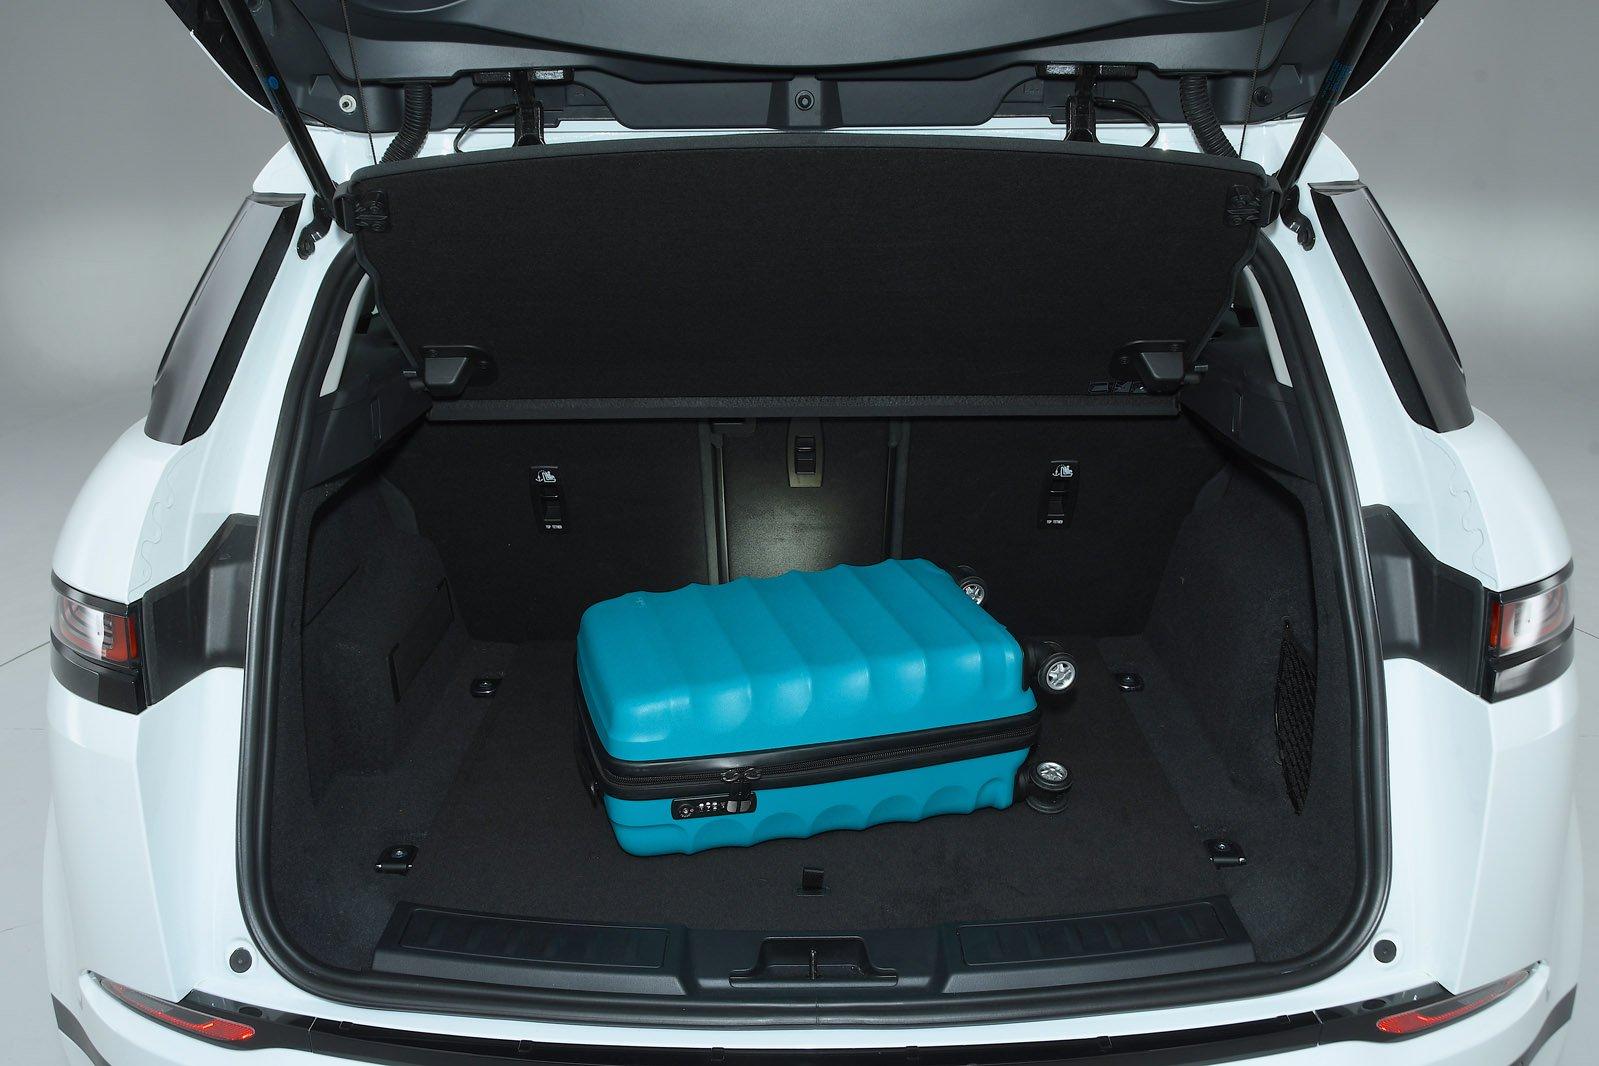 2019 Land Rover Range Rover Evoque boot open RHD